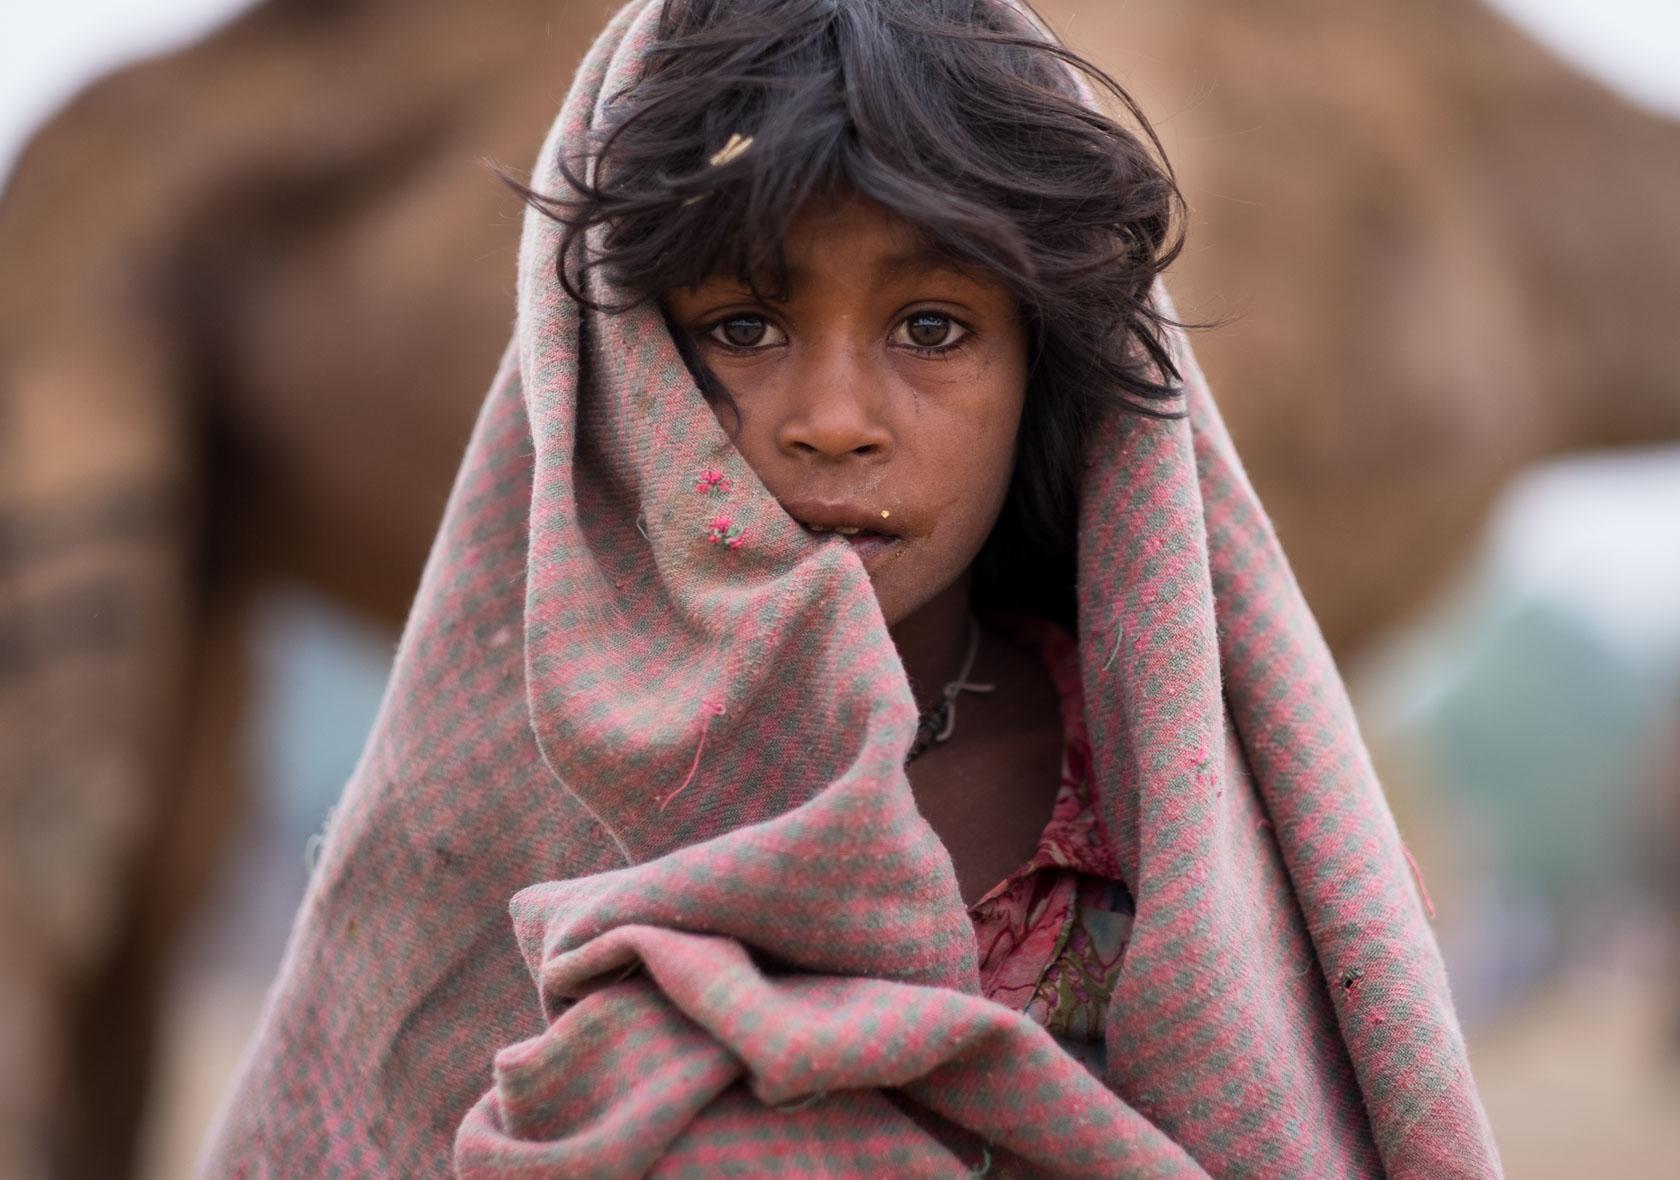 Gypsy Child, Pushkar, India